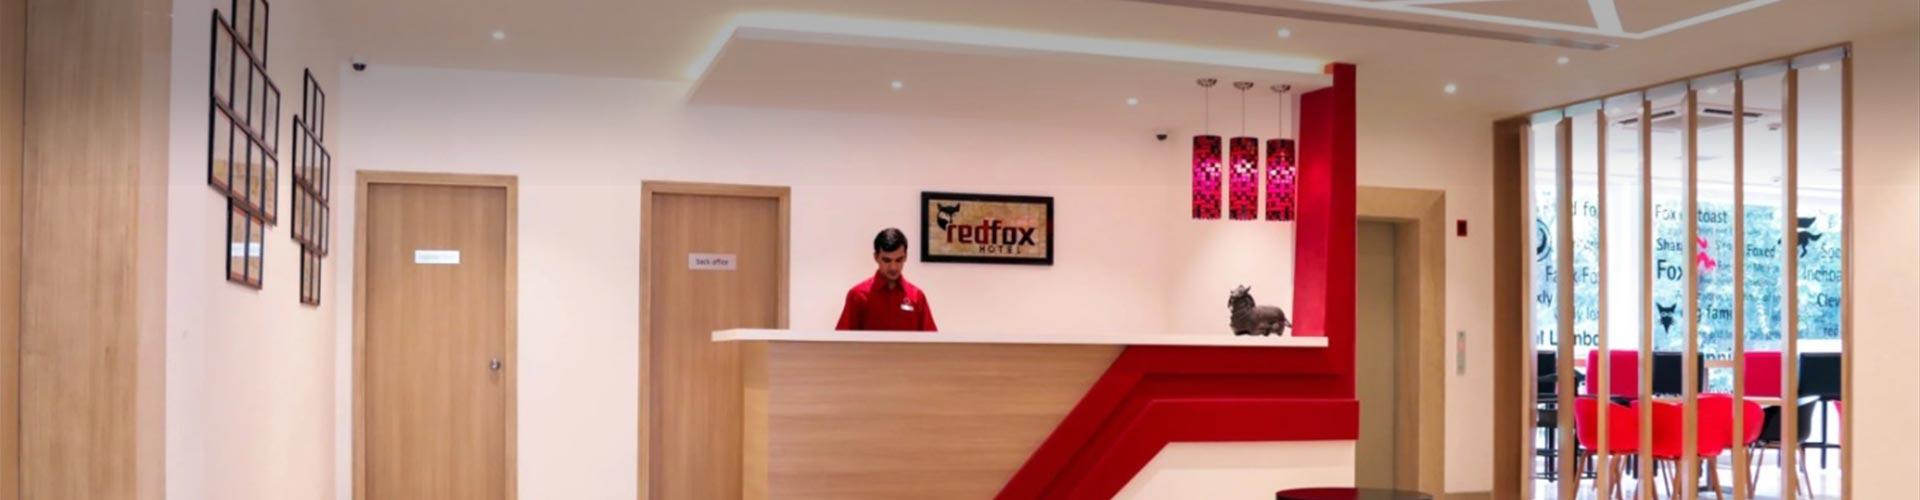 Red Fox Delhi Airport